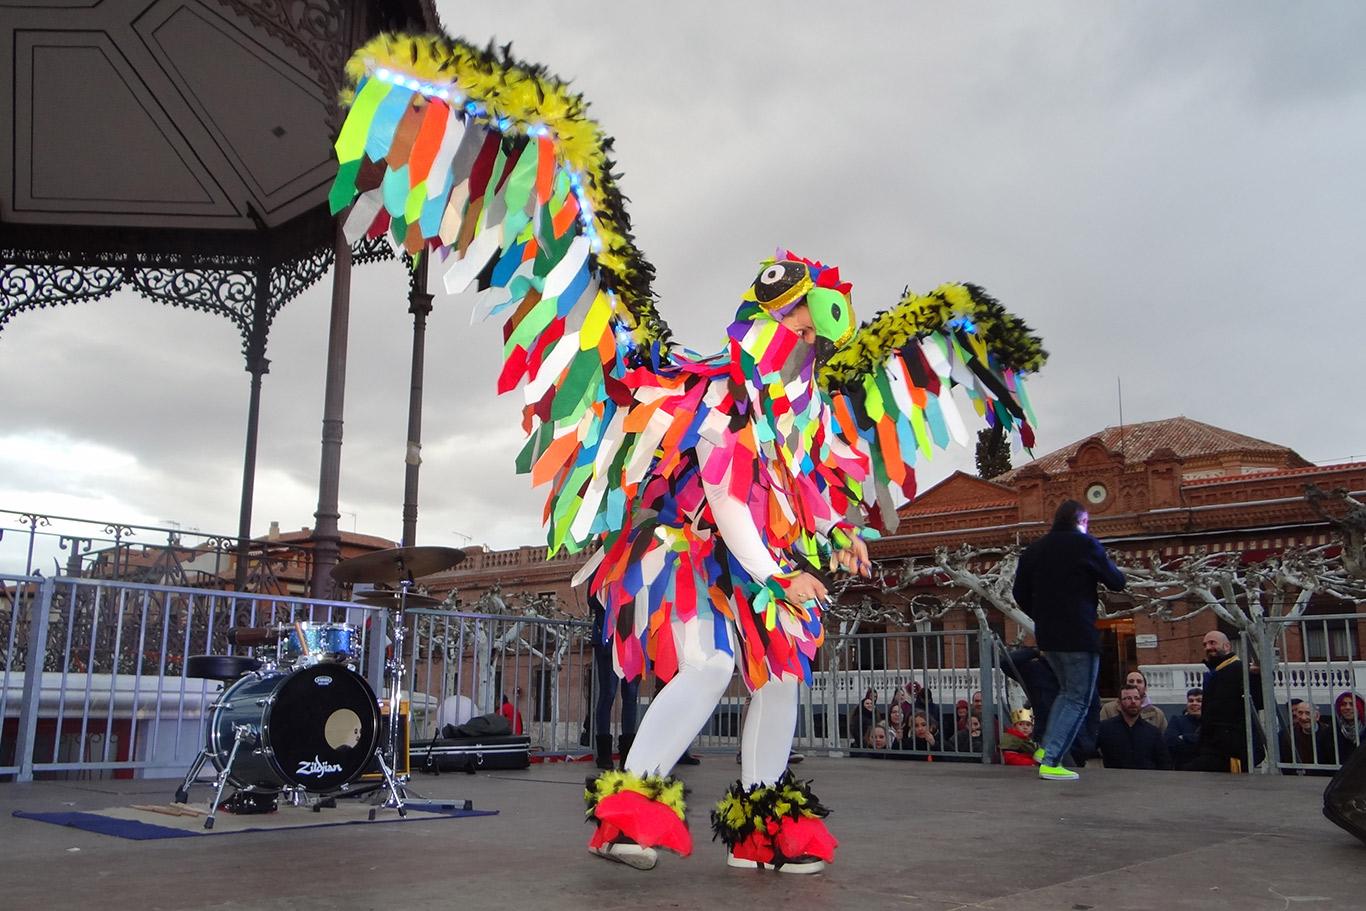 Concurso general de disfraces del carnaval 2018 de alcal de henares dream alcal - Disfrazes para carnaval ...